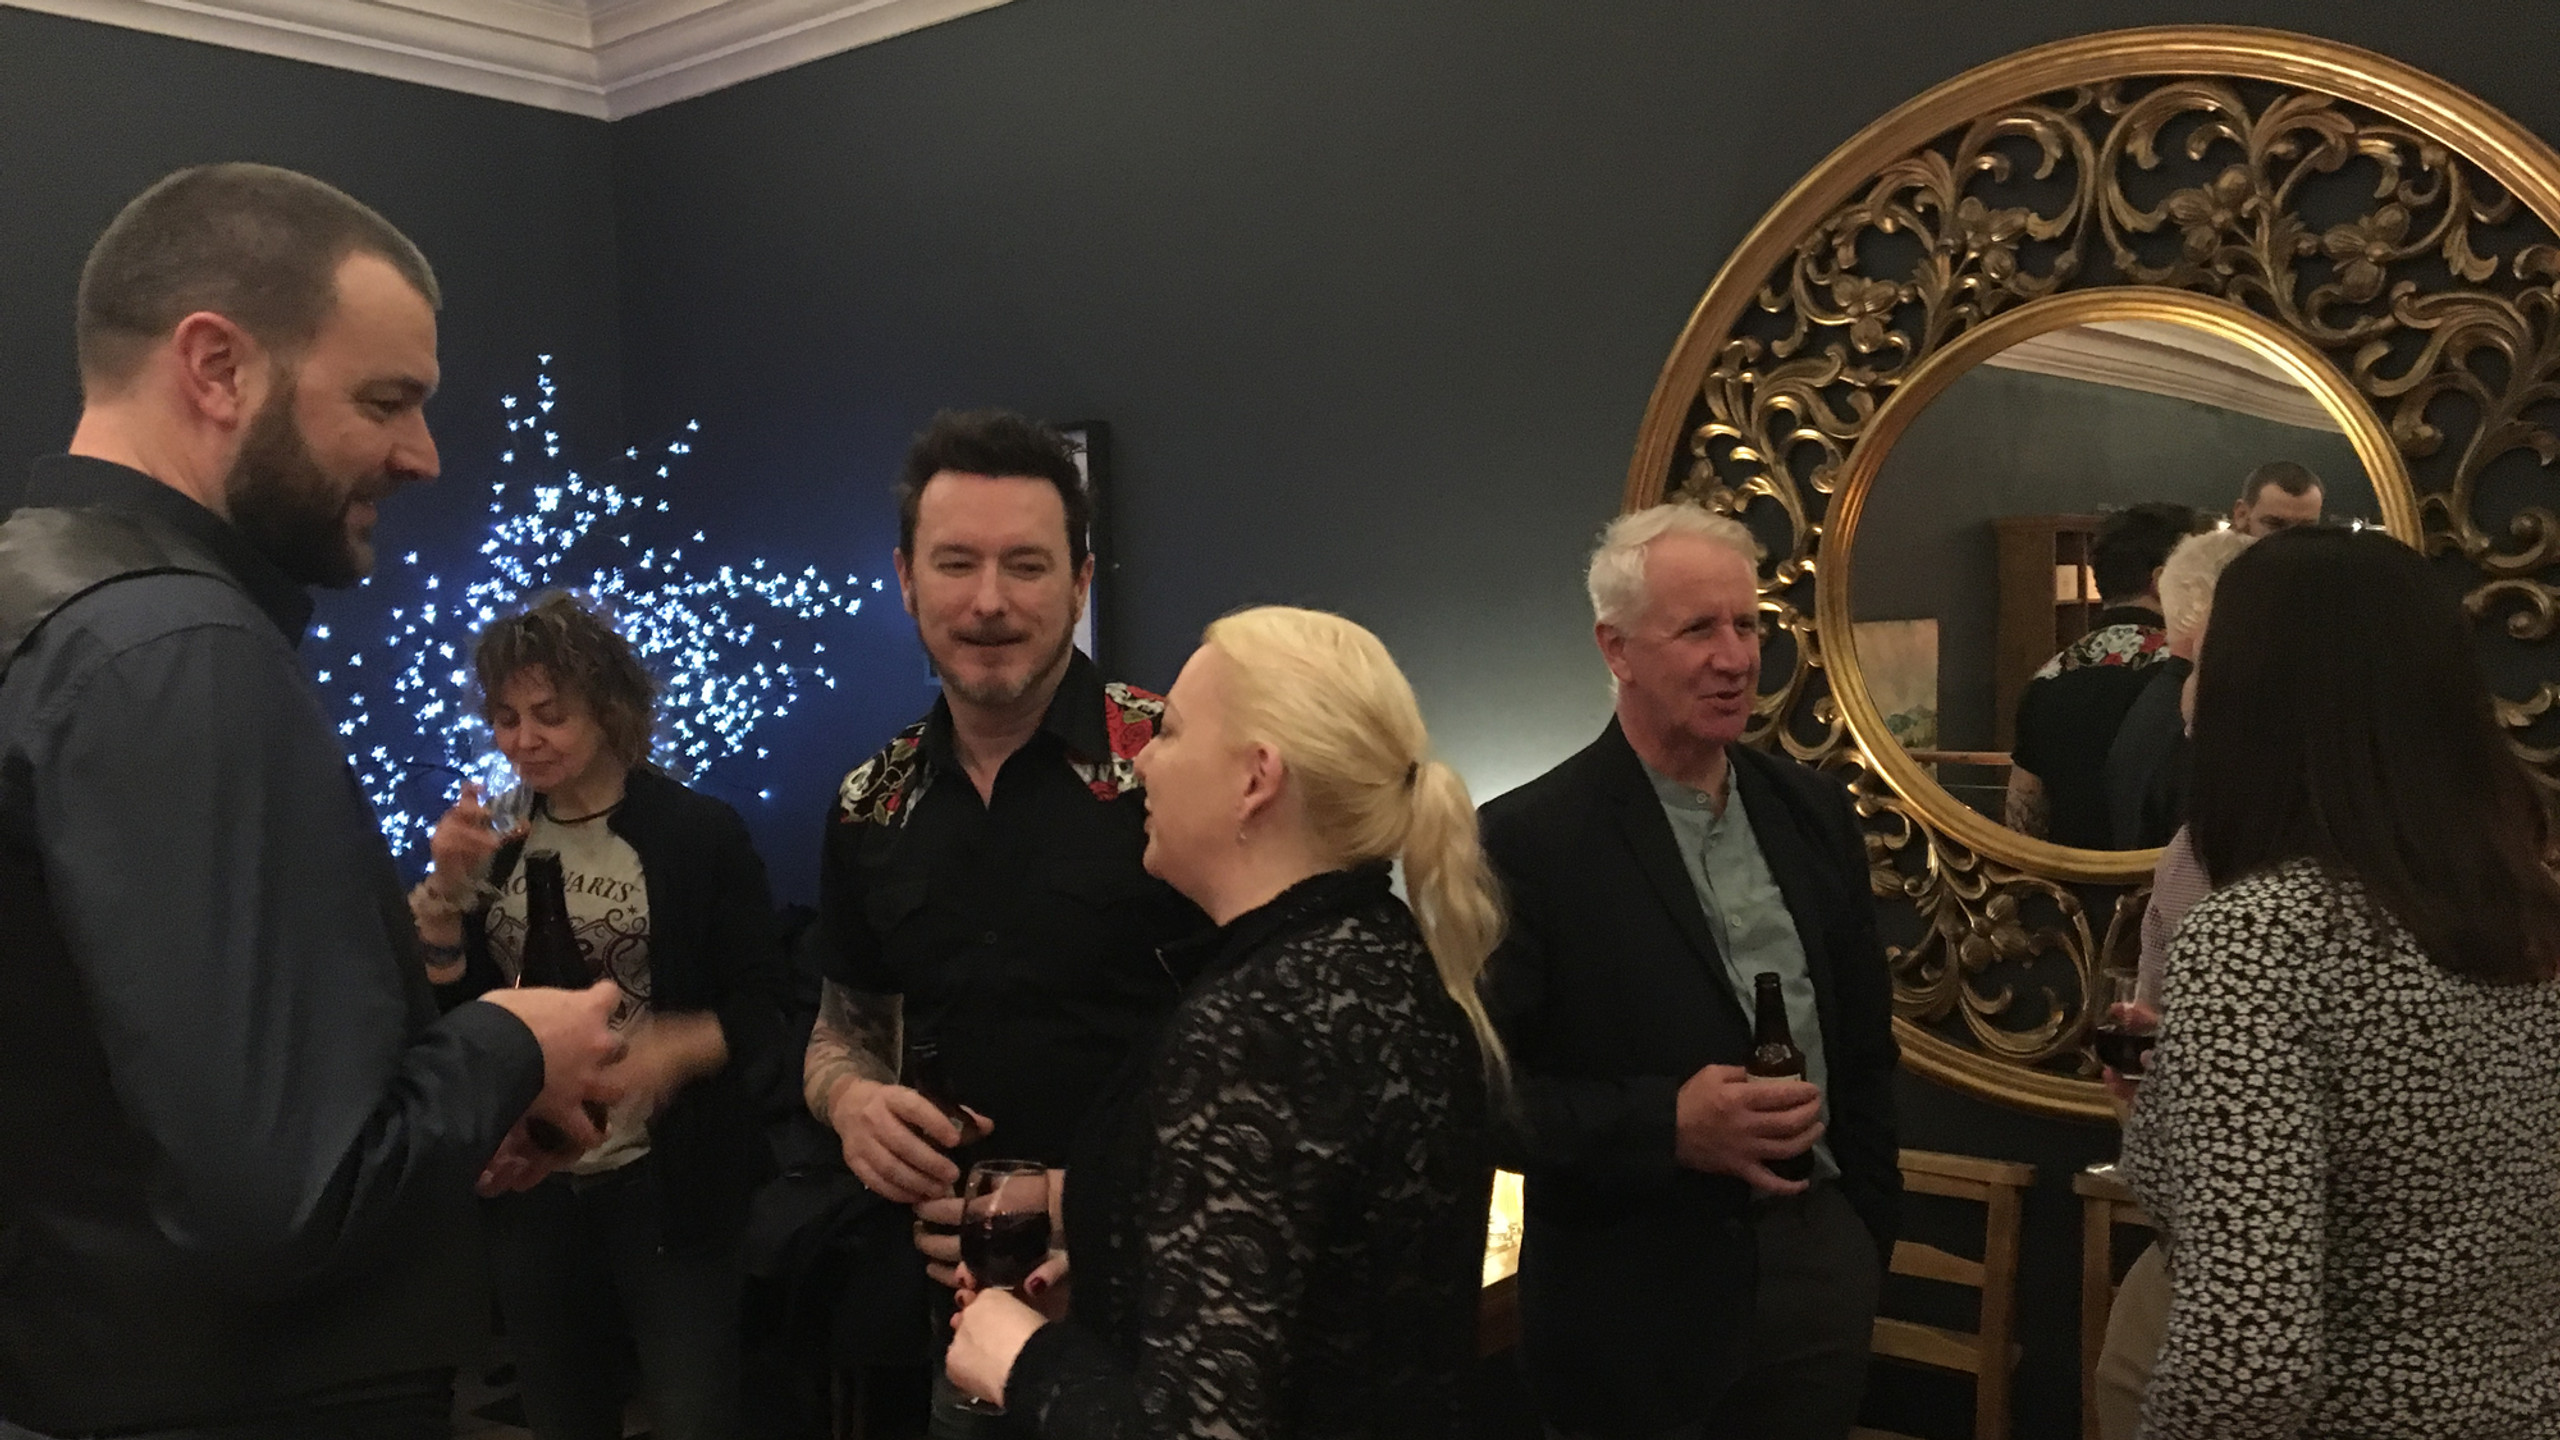 Robert S Malan (Luna Senior Editor and writer), Steph Bianchini (Editor, The Earthian Hivemind), Del and Kim Lakin-Smith (Writer), Peter Garrett (Writer).